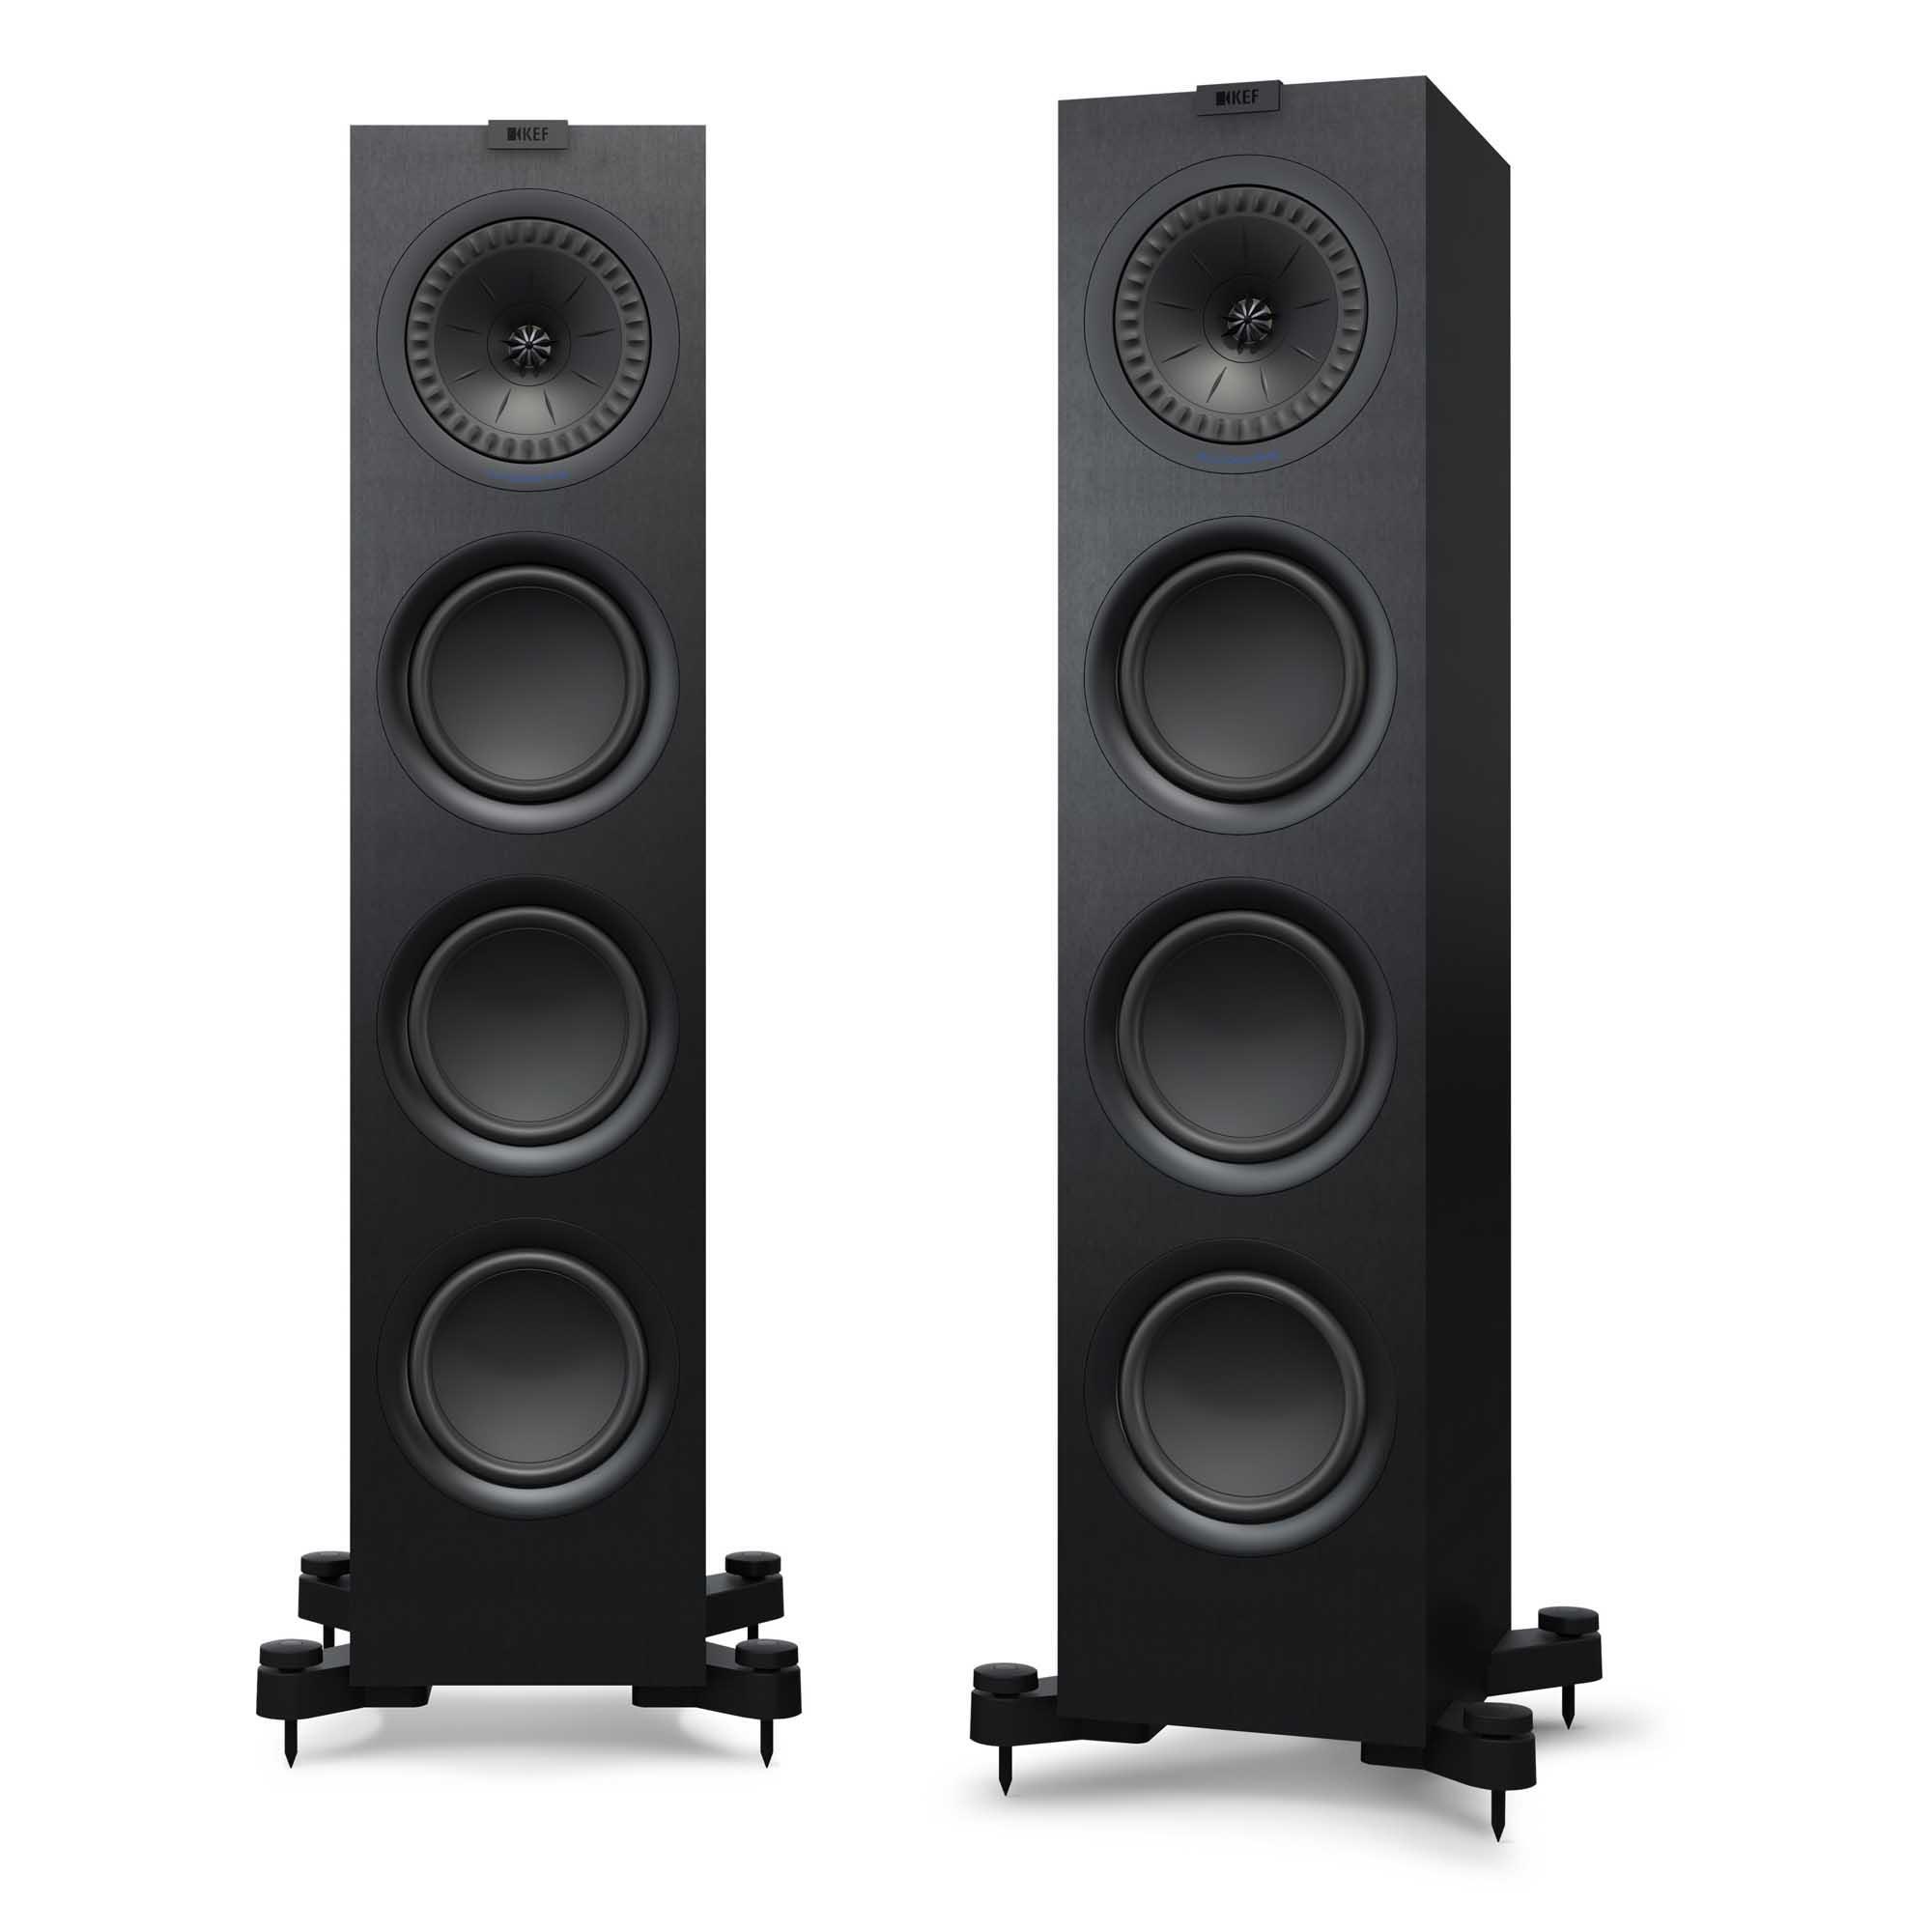 Sevenoaks Sound And Vision Kef Q750 Floorstanding Speakers